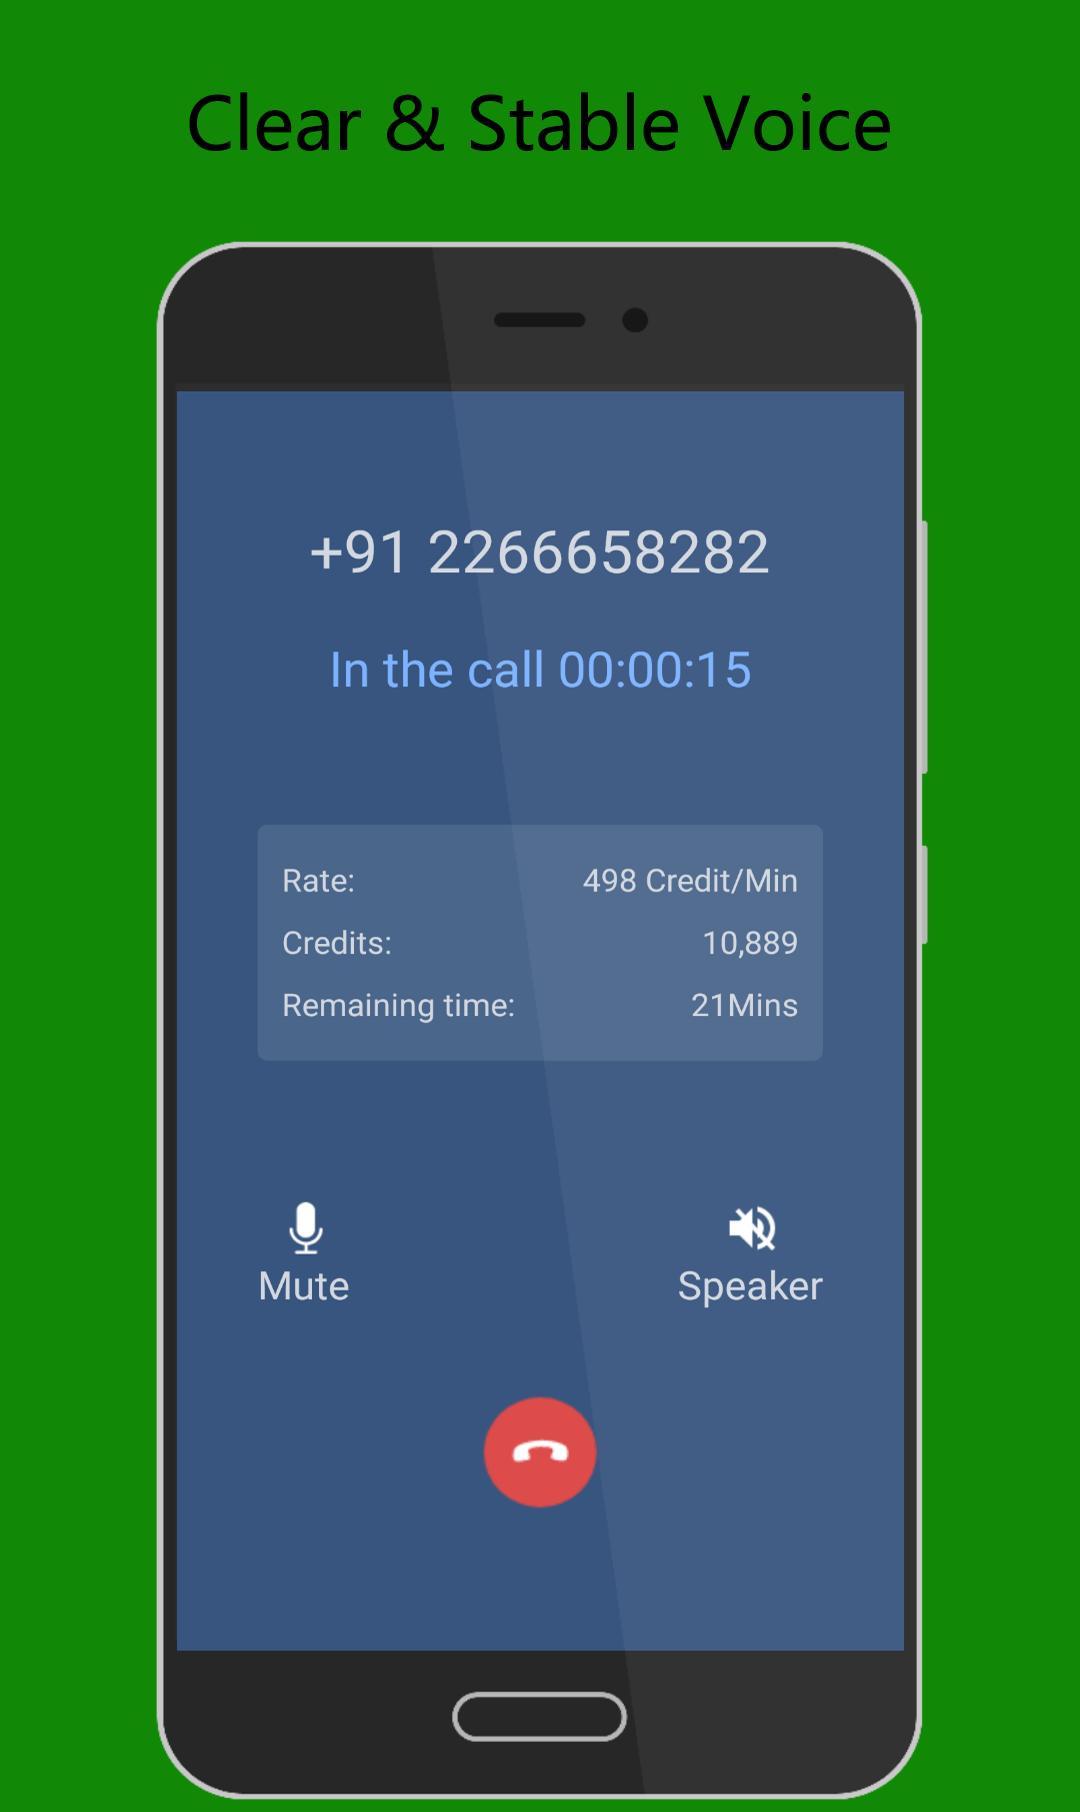 Call Global - Free International Phone Calling App for